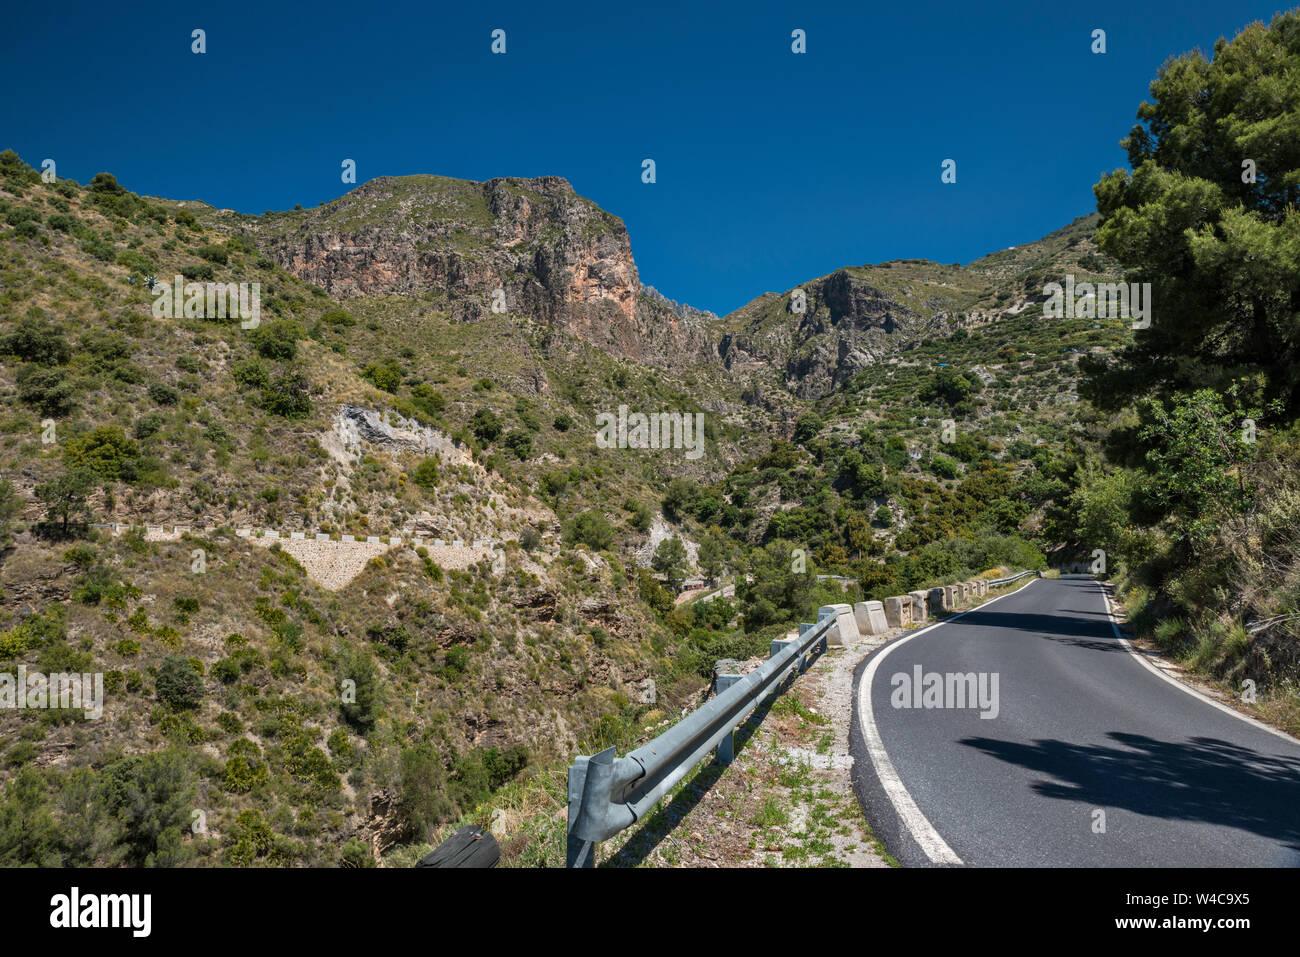 A4050 Road en la Sierra del Chaparral, cerca de la aldea de Lentegi, provincia de Granada, Andalucía, España Foto de stock